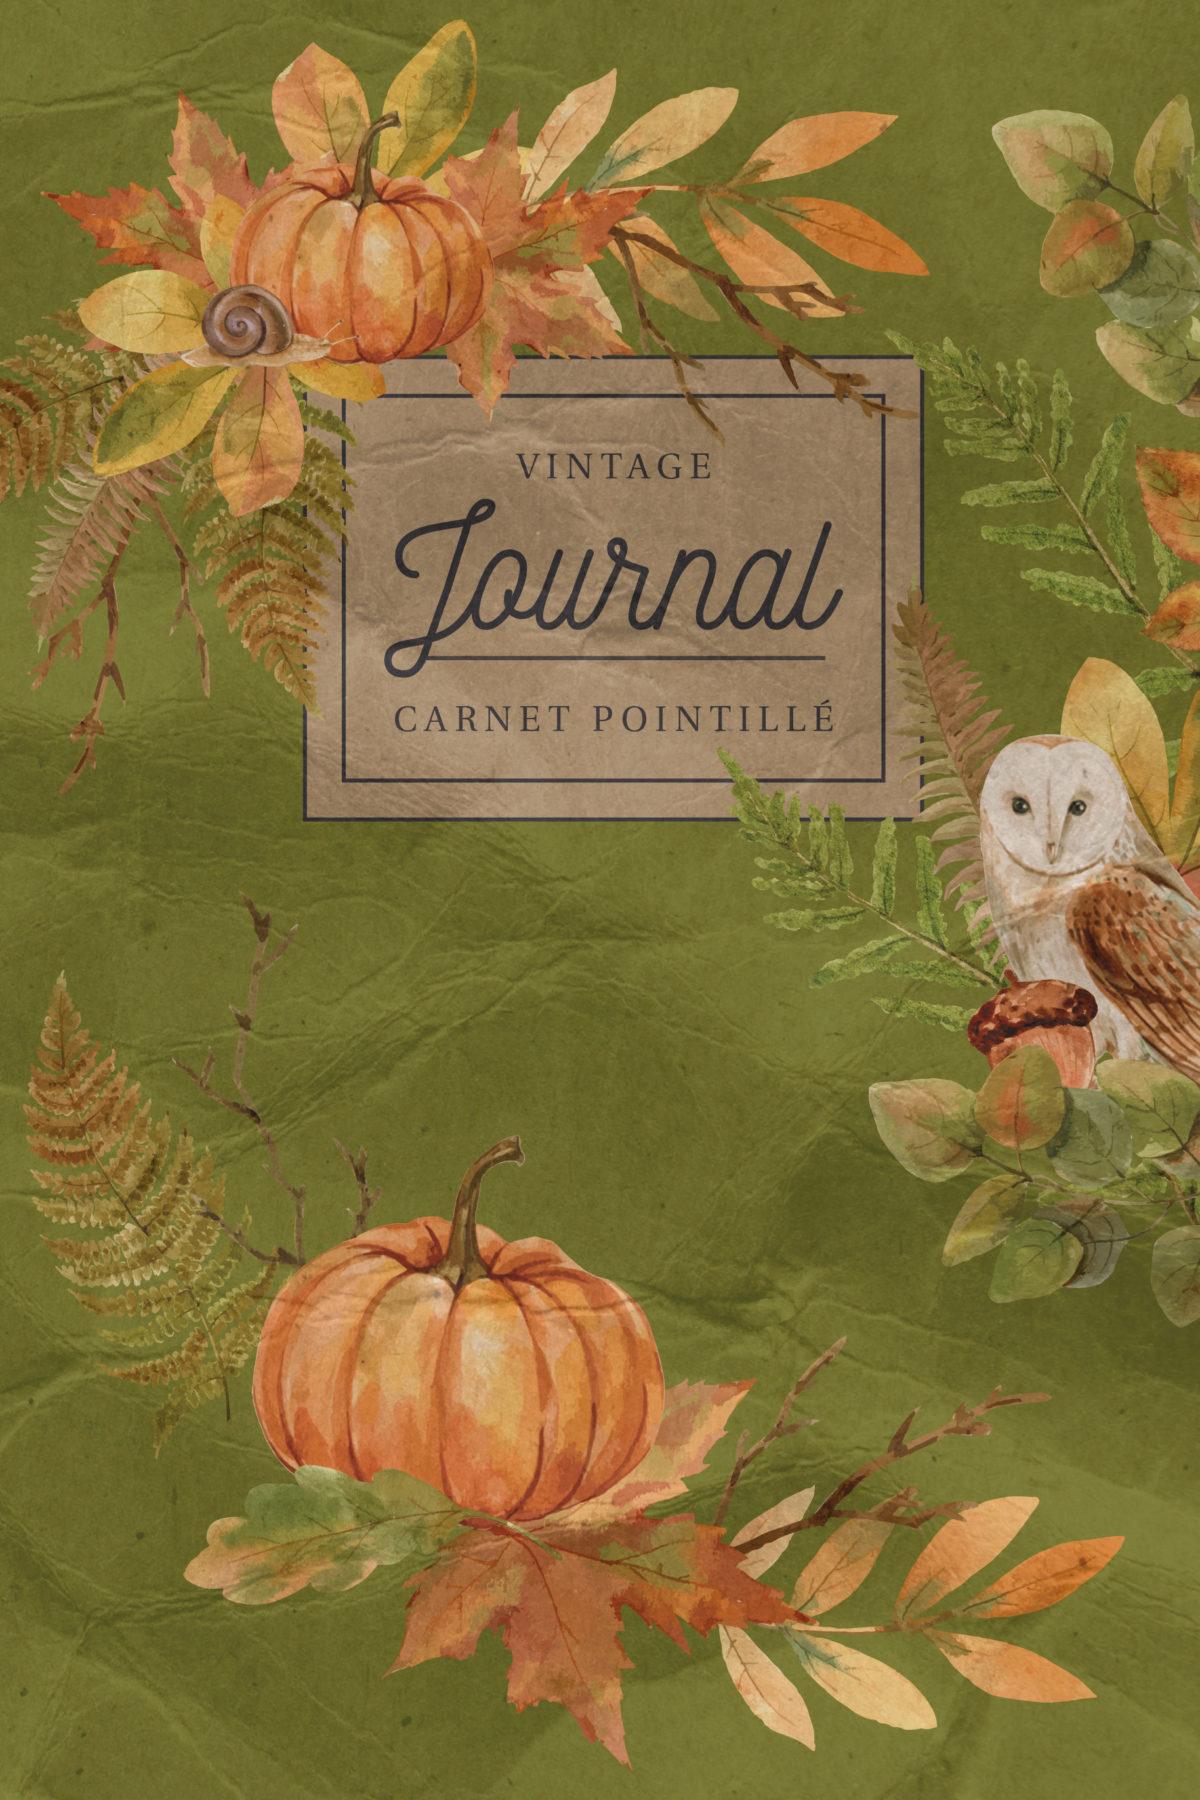 Carnet de notes pointillé Bullet Journal